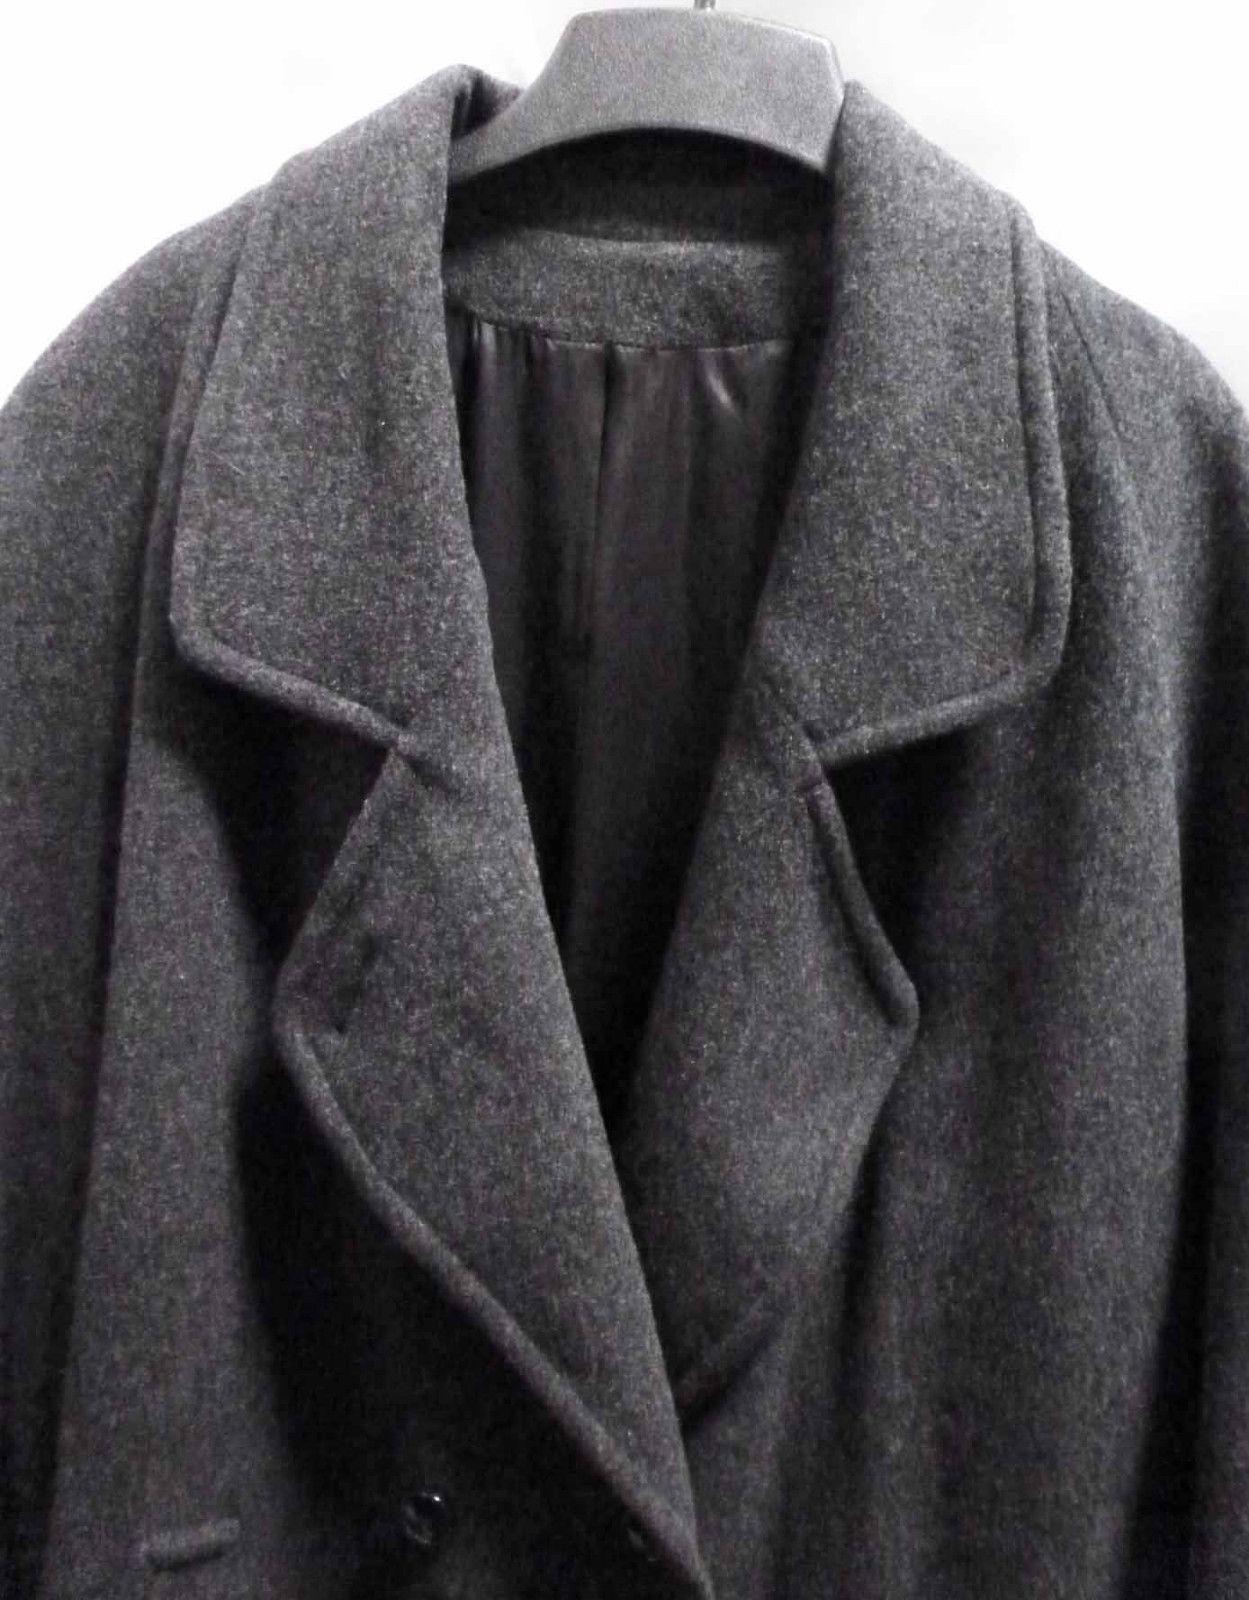 Vintage Gray Wool Top Coat Warm Heavyweight Overc… - image 4